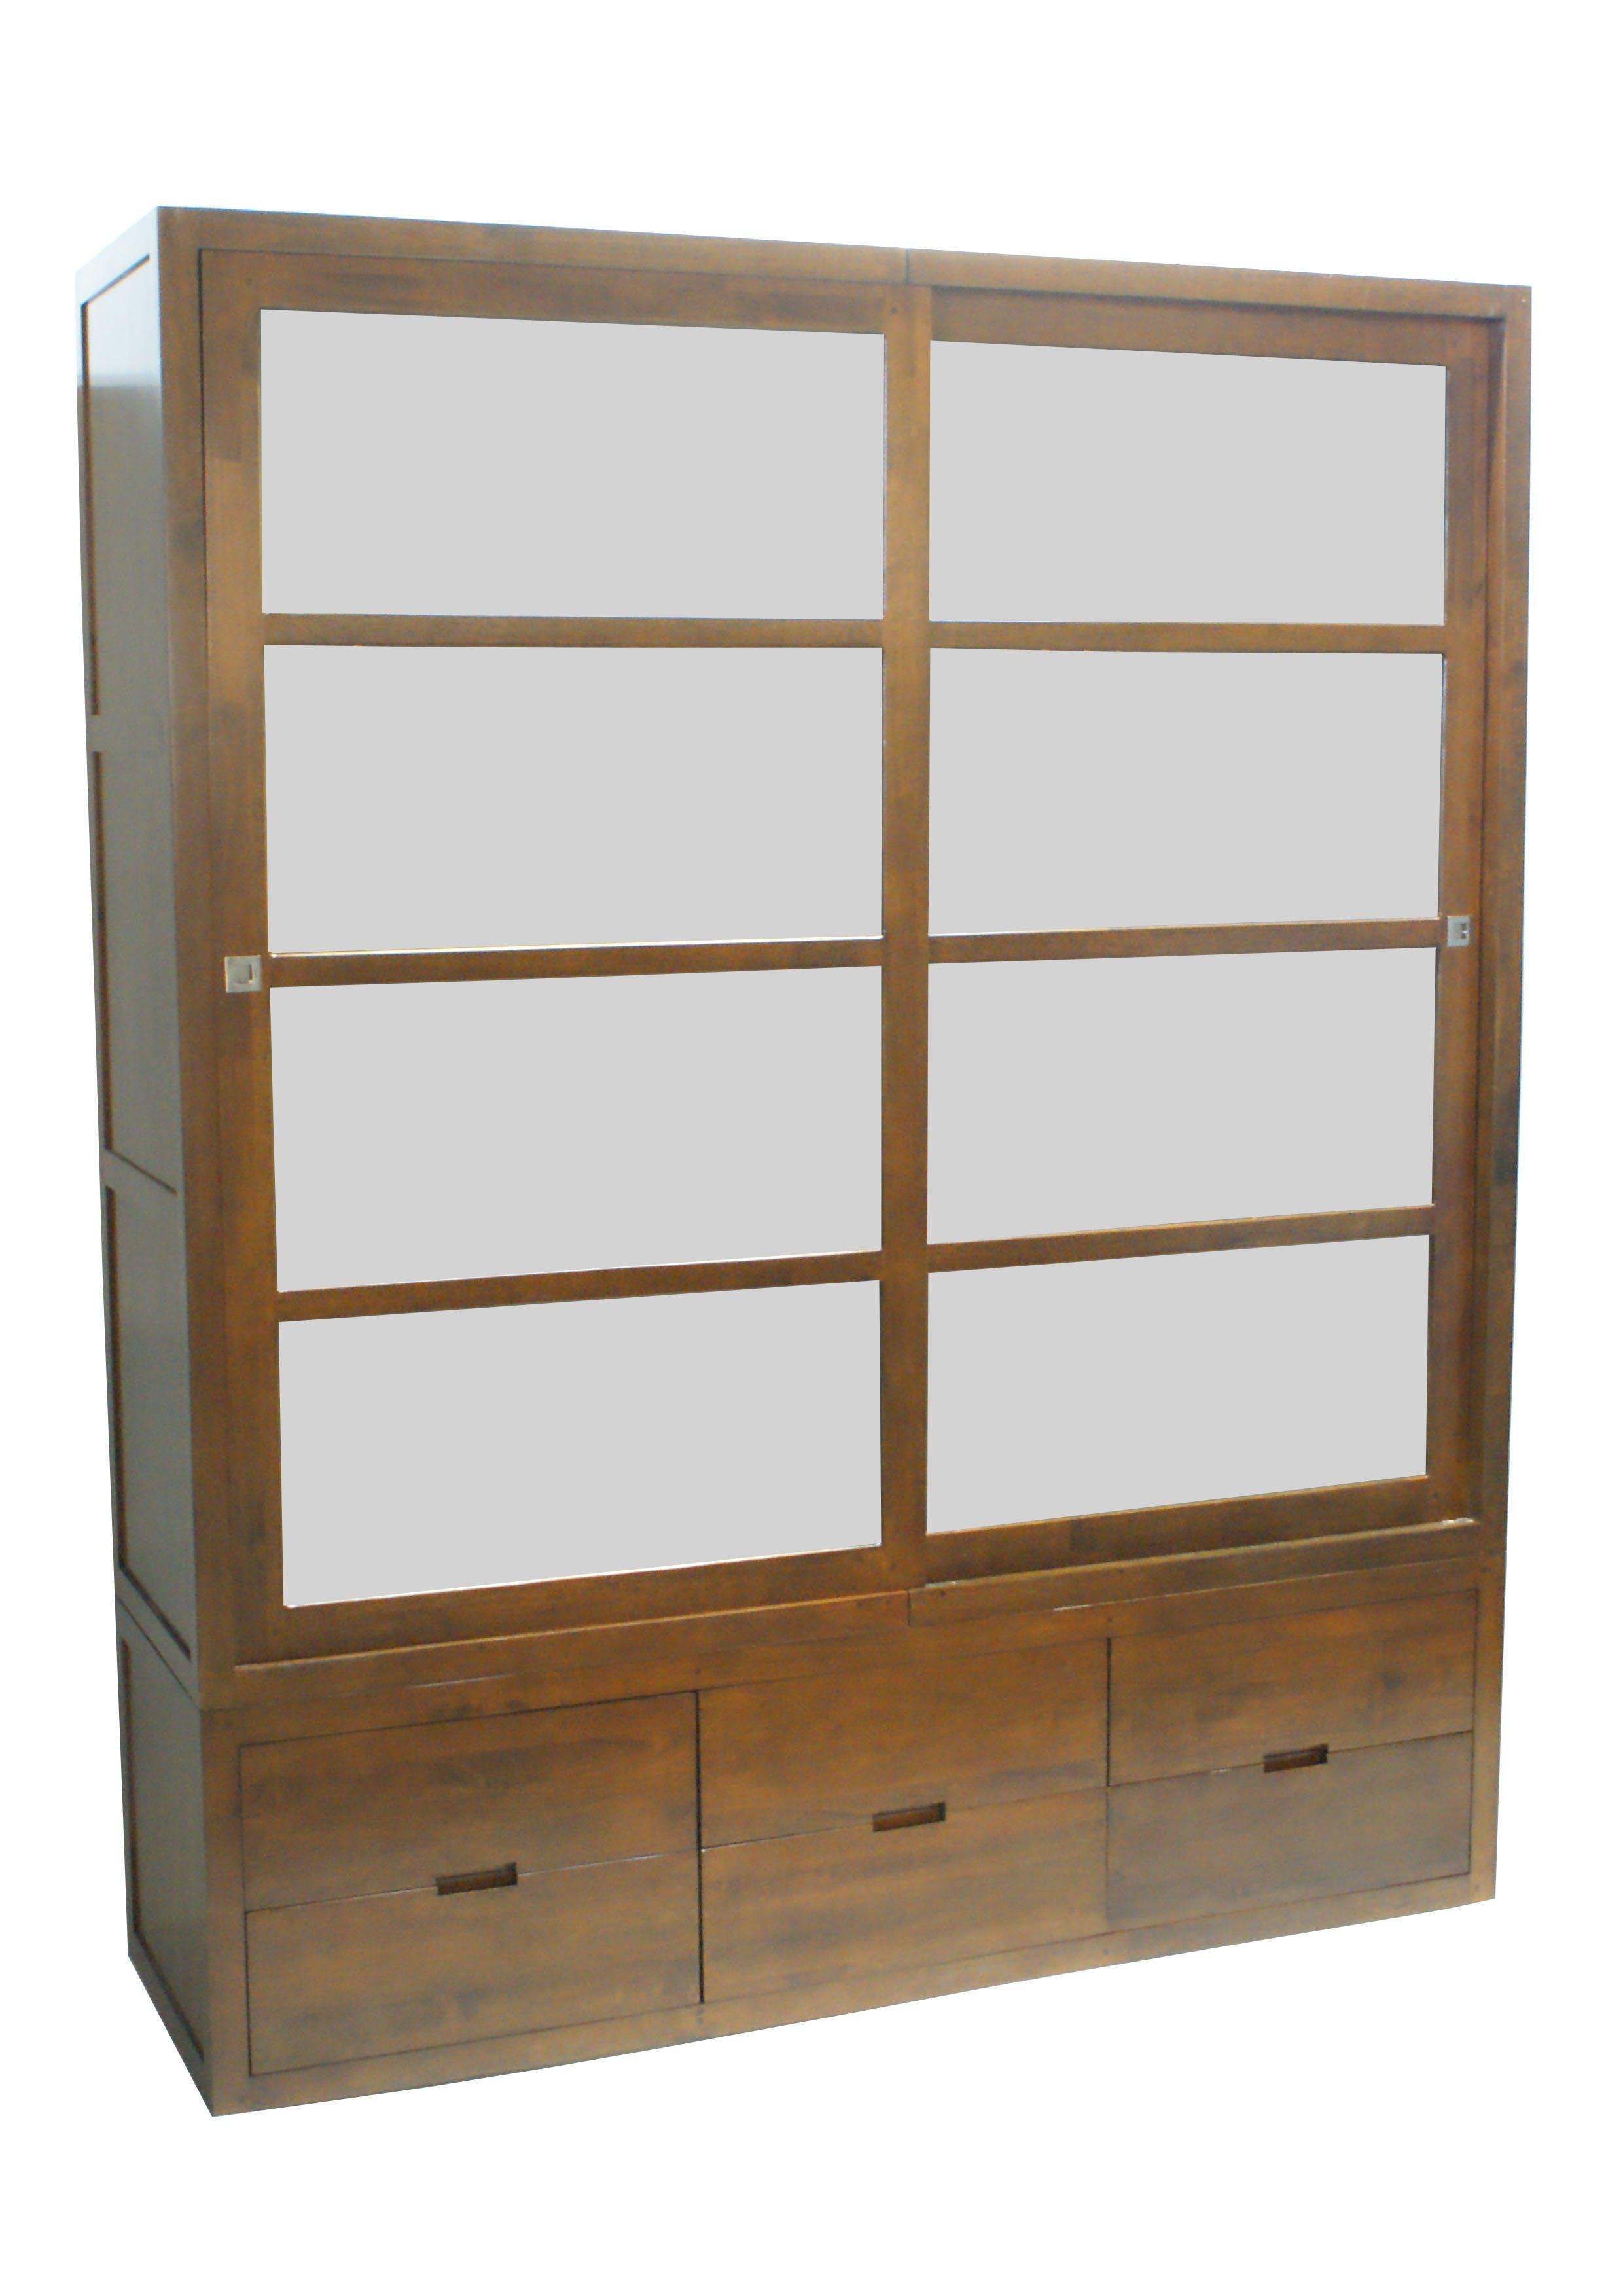 Armoire Hévéa 2 portes coulissantes, 6 tiroirs 55x180x220cm OLGA